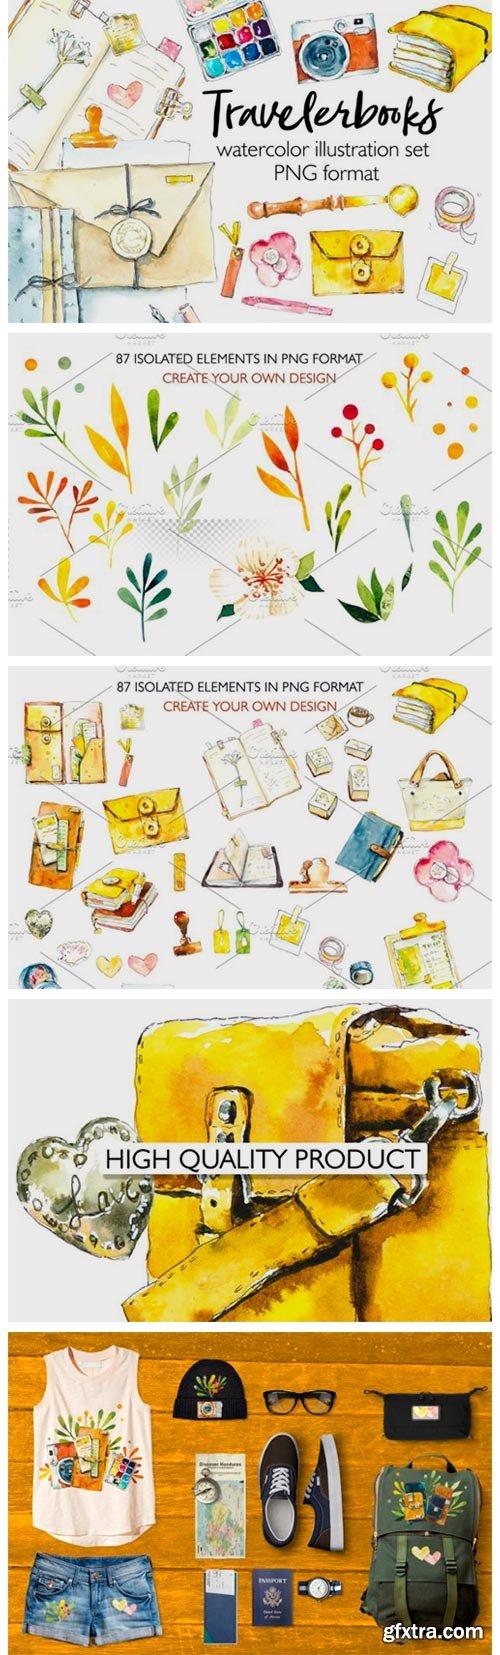 Travelbooks. Watercolor Clipart. 4164381